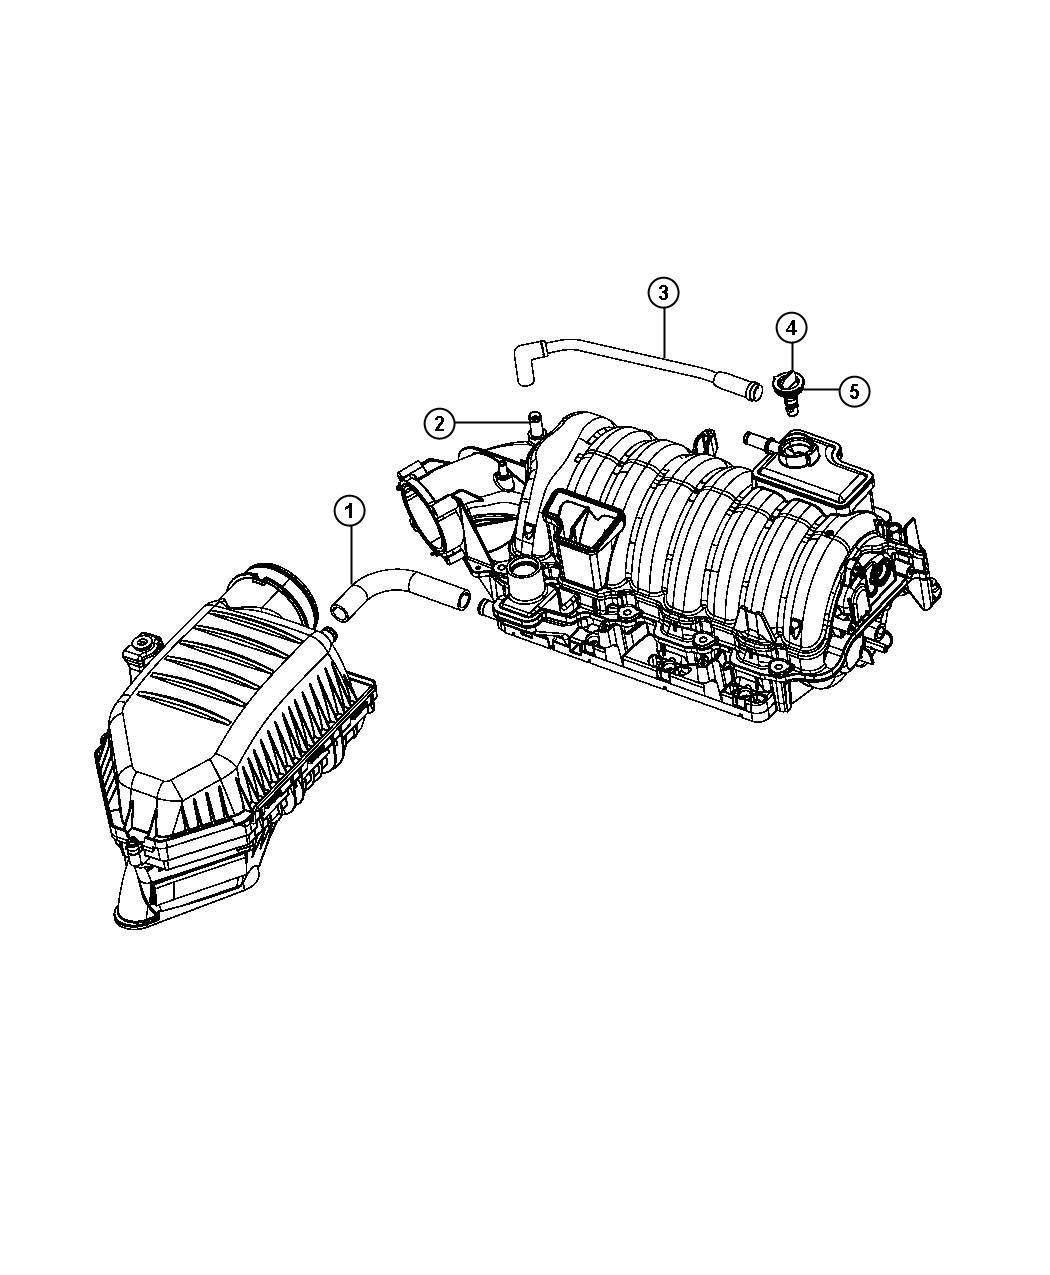 Dodge Charger Valve Pcv Crankcase Ventilation Mds